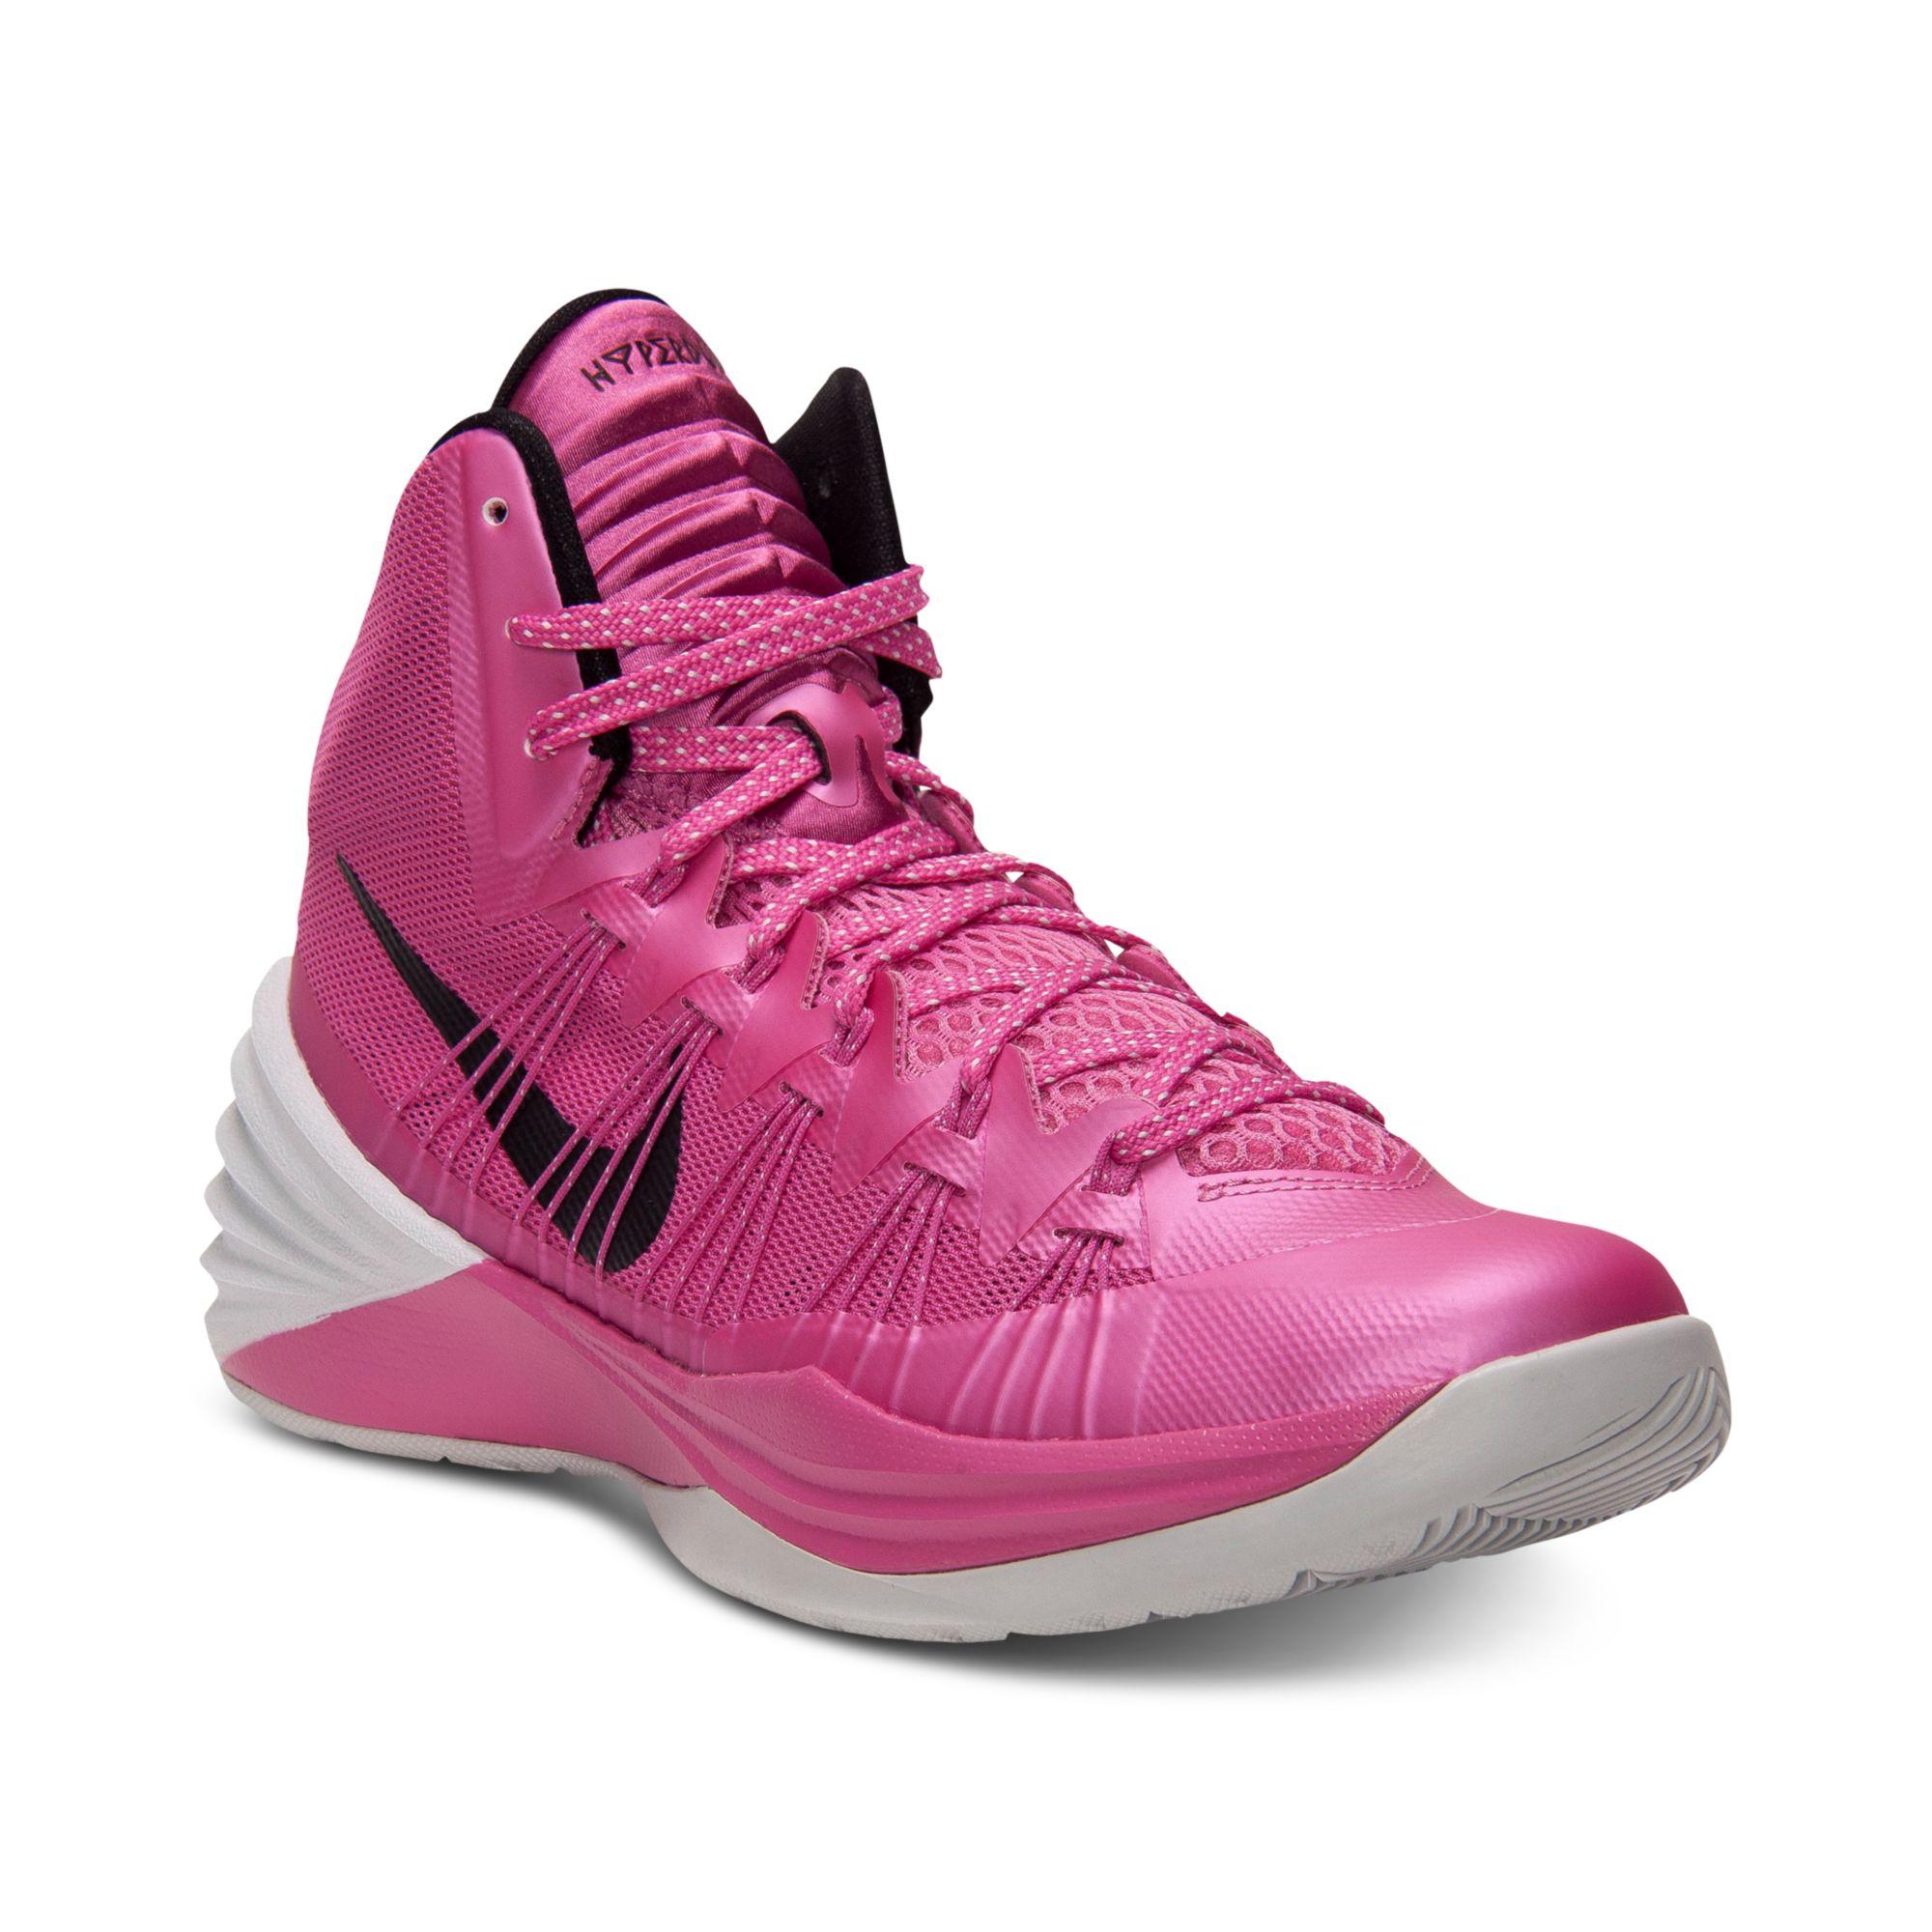 98ec48ee8f59 Lyst - Nike Hyperdunk Basketball Sneakers in Pink for Men